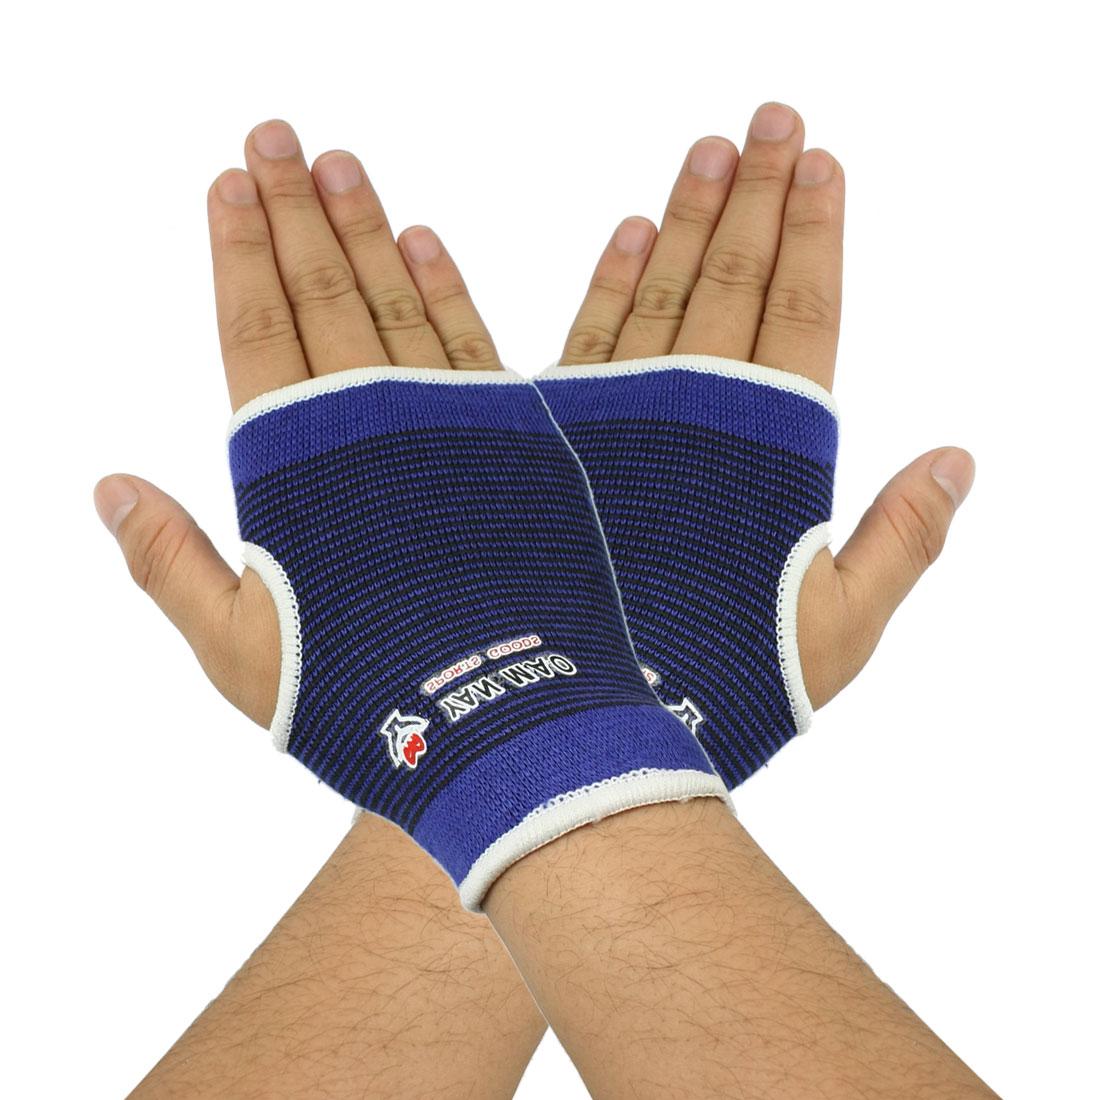 Black Blue Pinstripes Elastic Palm Support Sport Protectors Pair